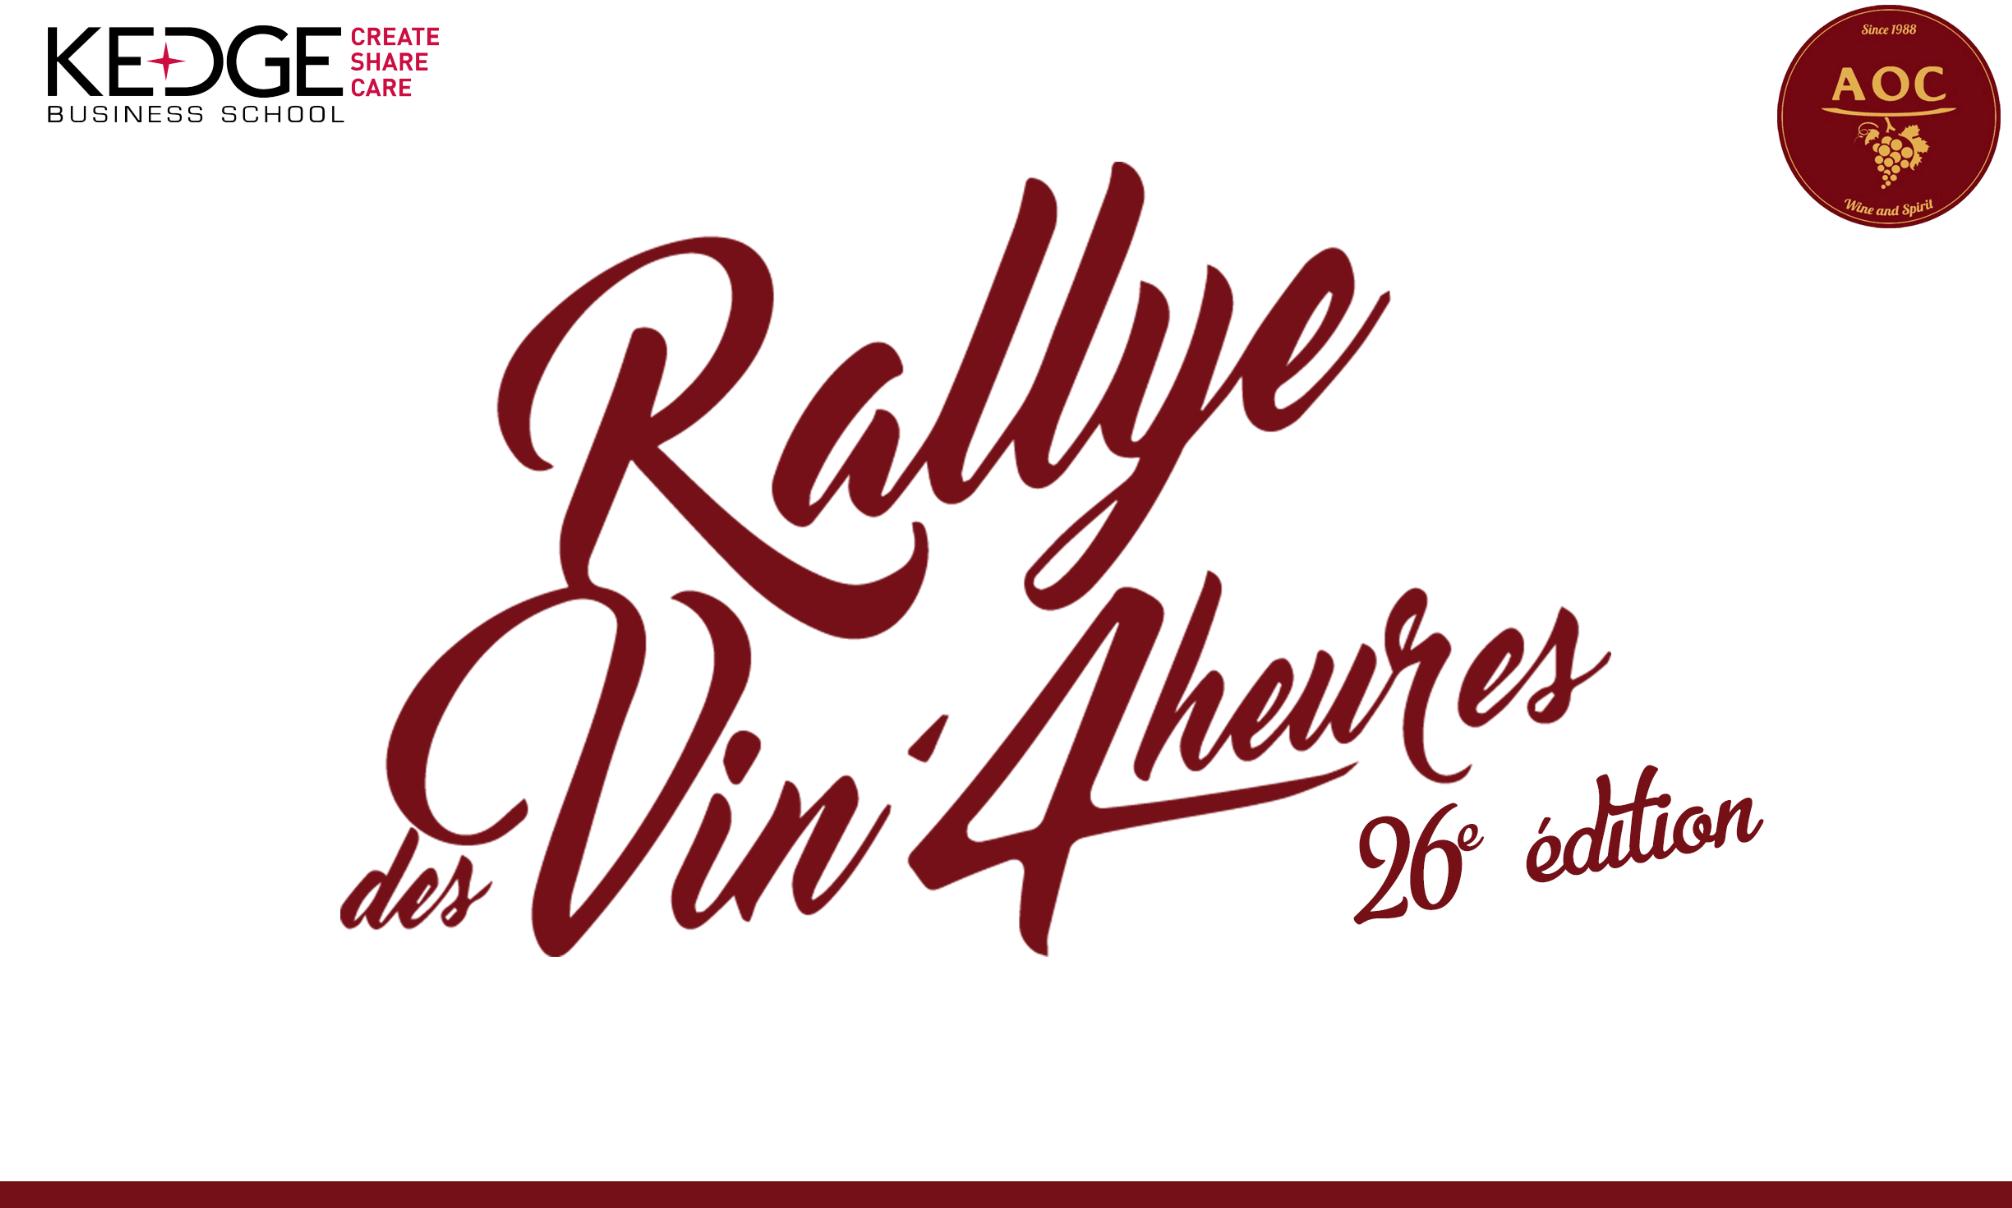 Le Rallye des Vin'4 heures